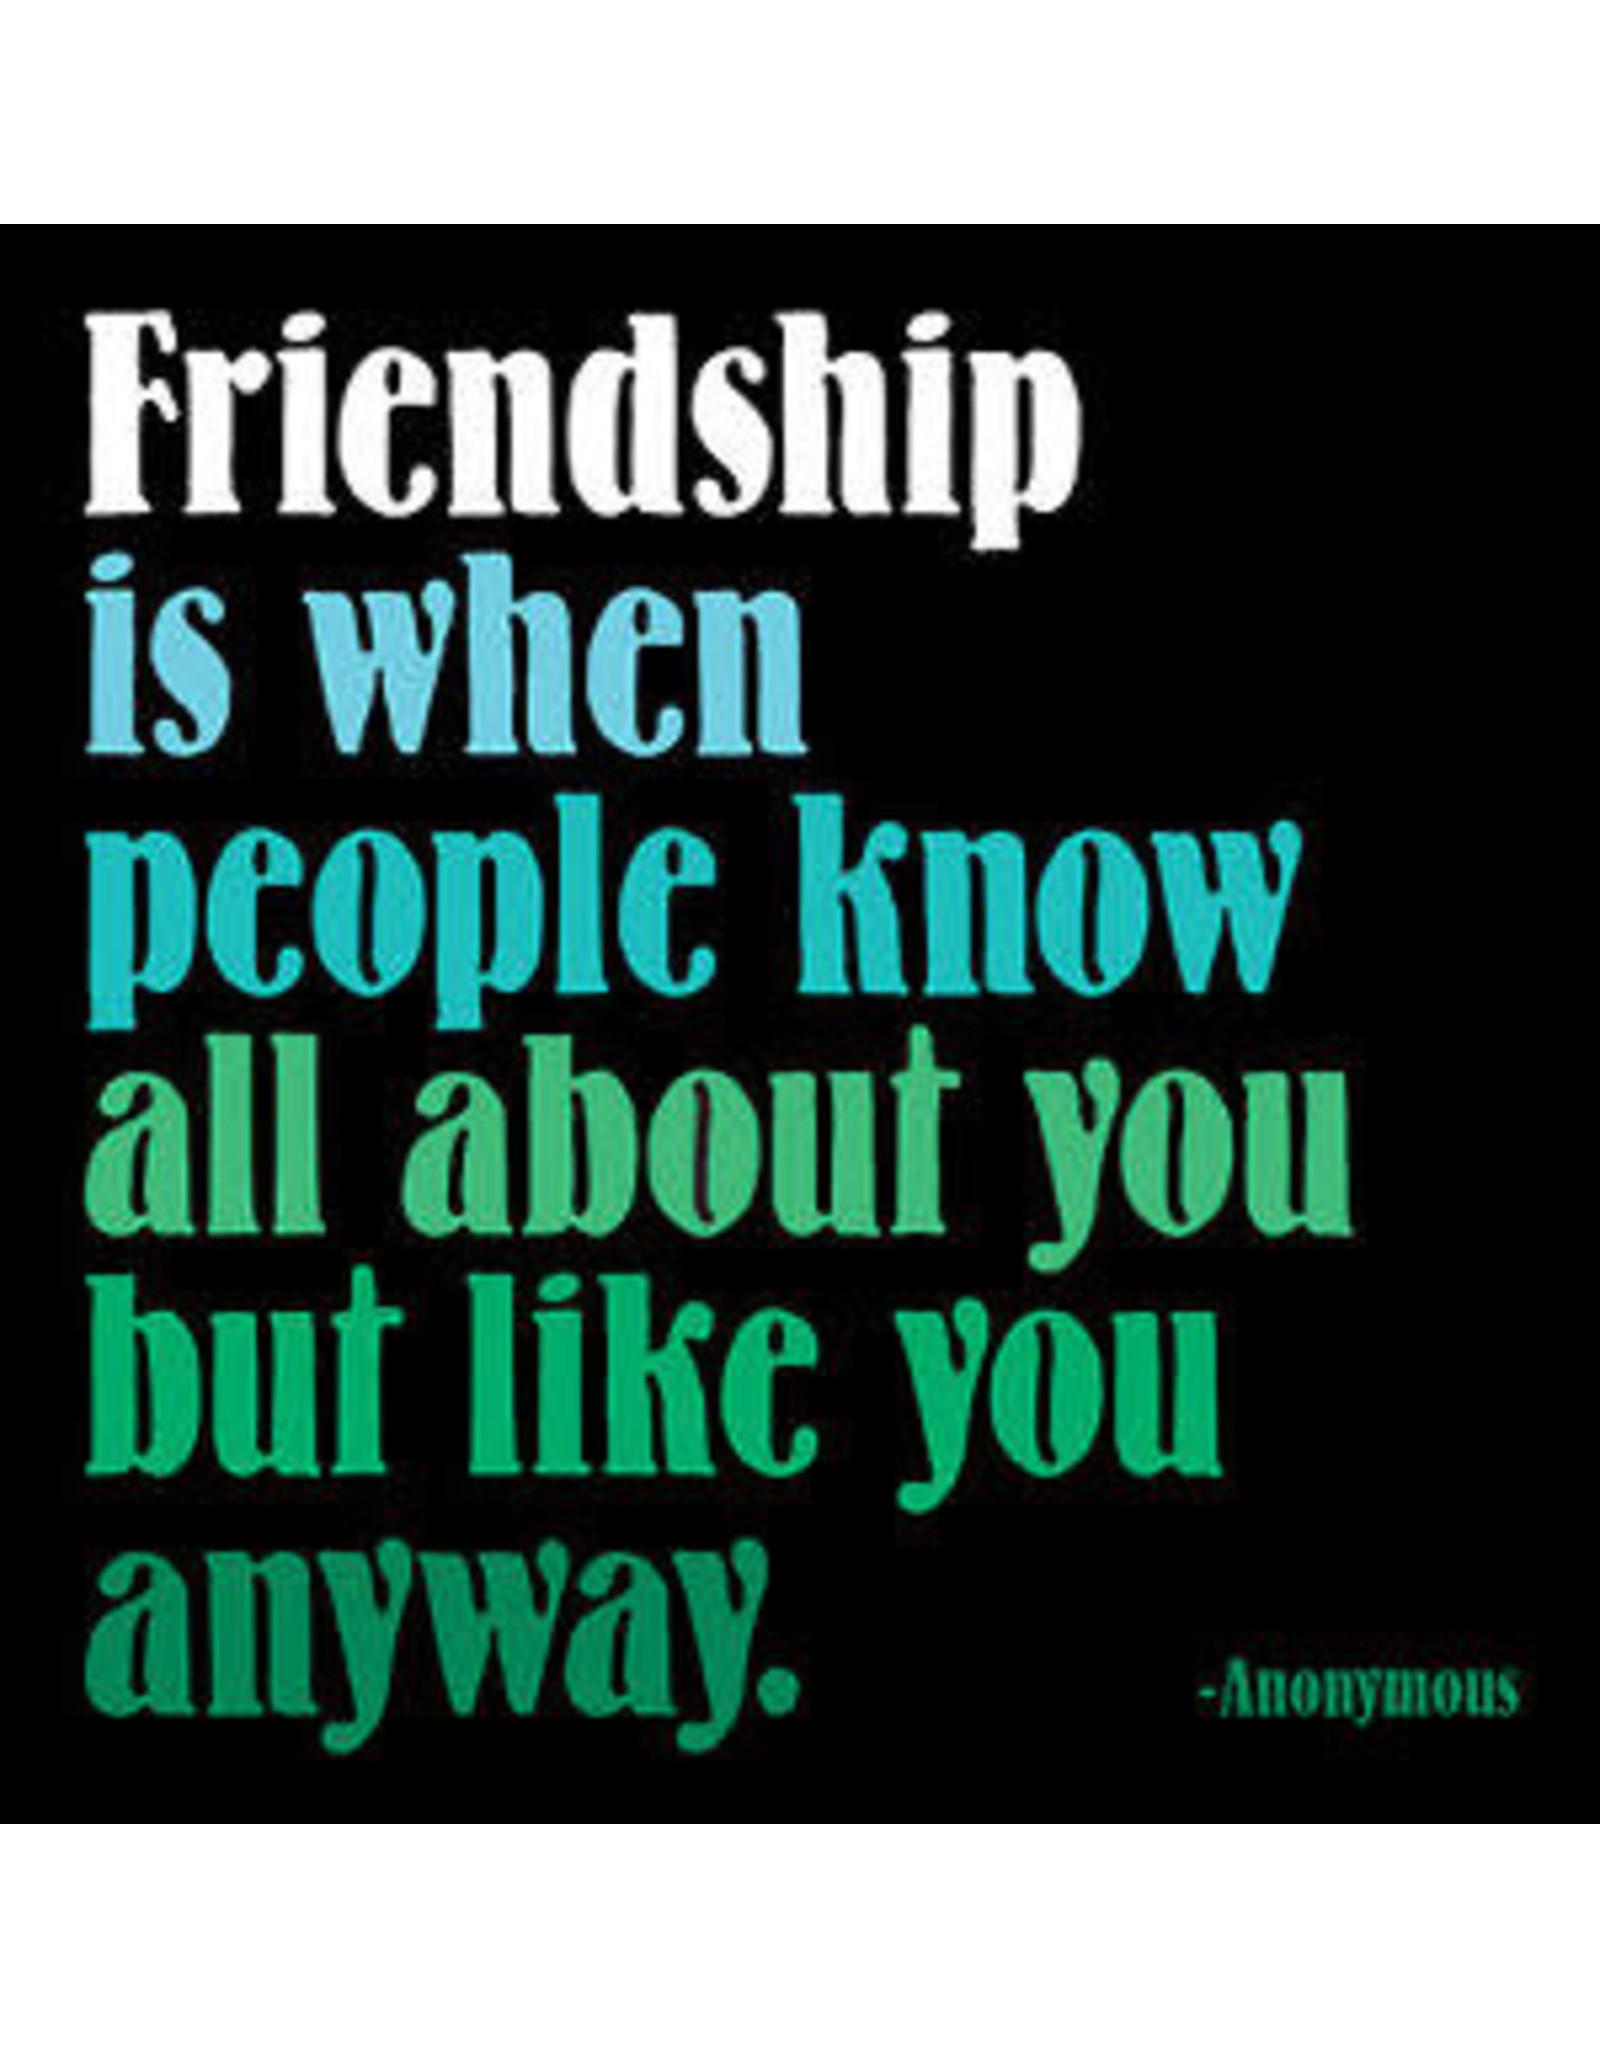 Quotable Friendship Quotable Cards